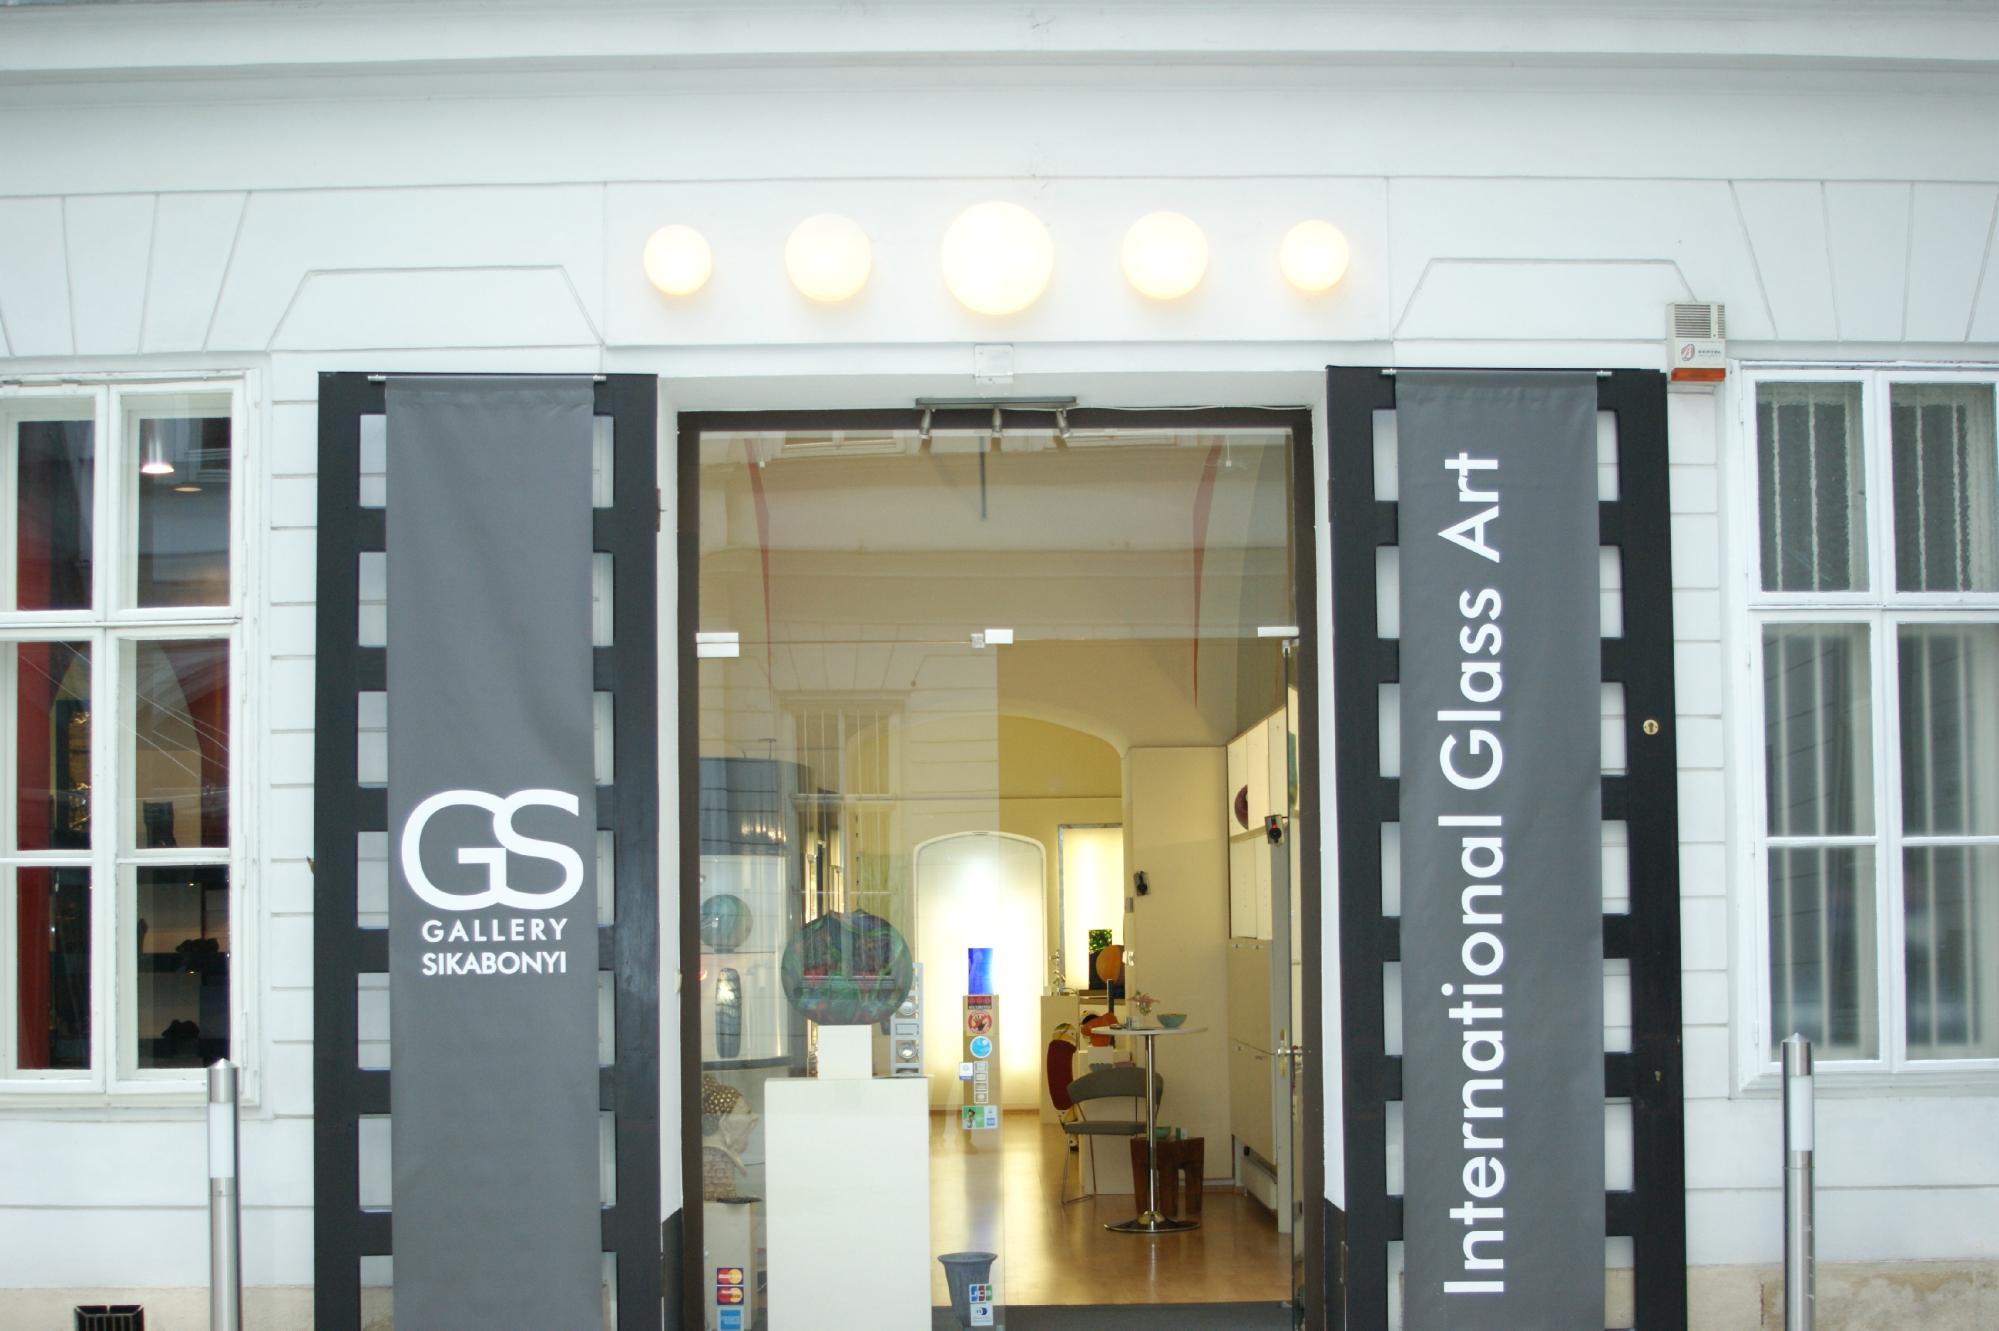 Glass gallery Sikabonyi